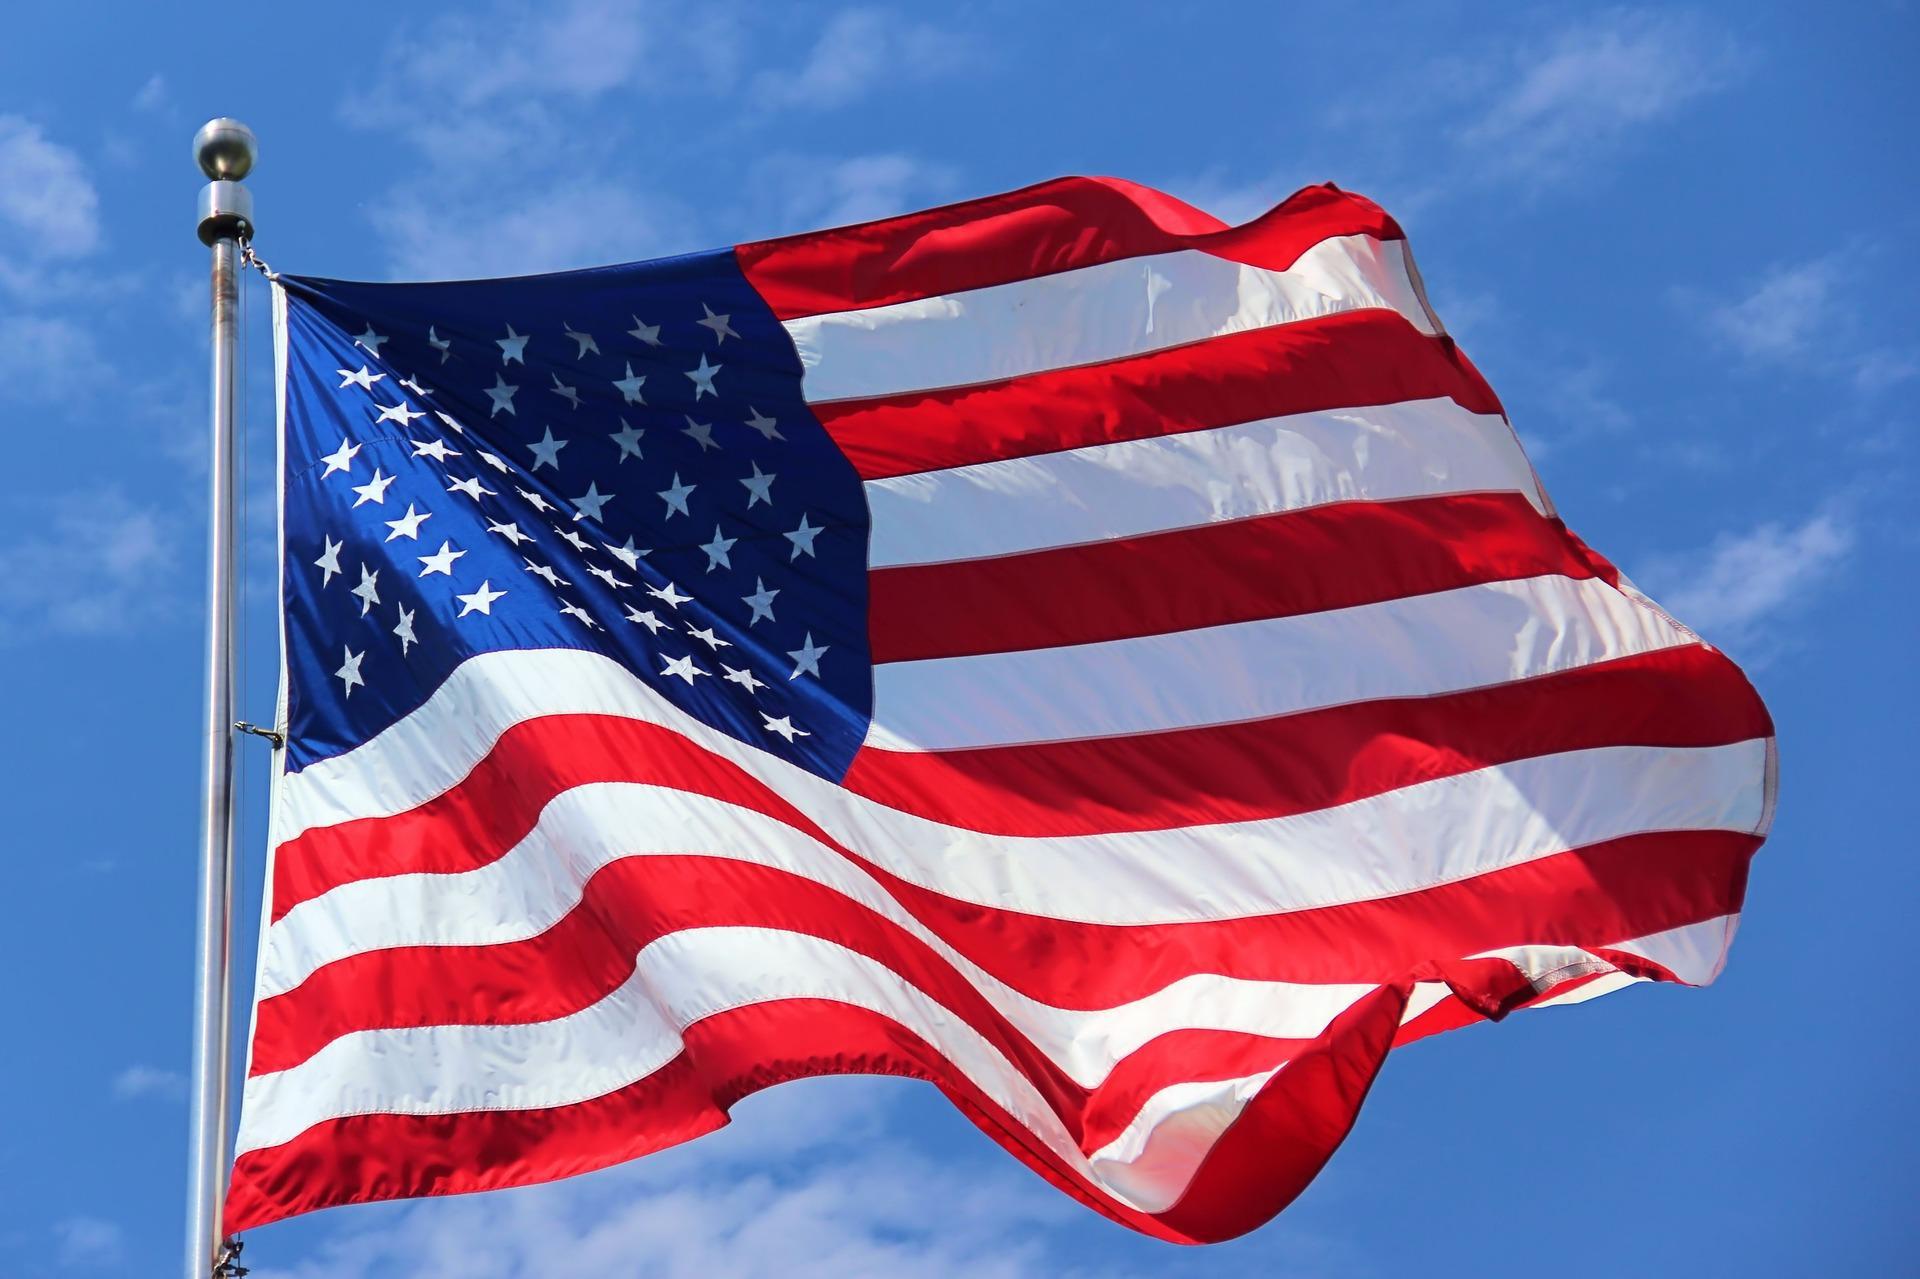 American Flag - Large - 2.JPG